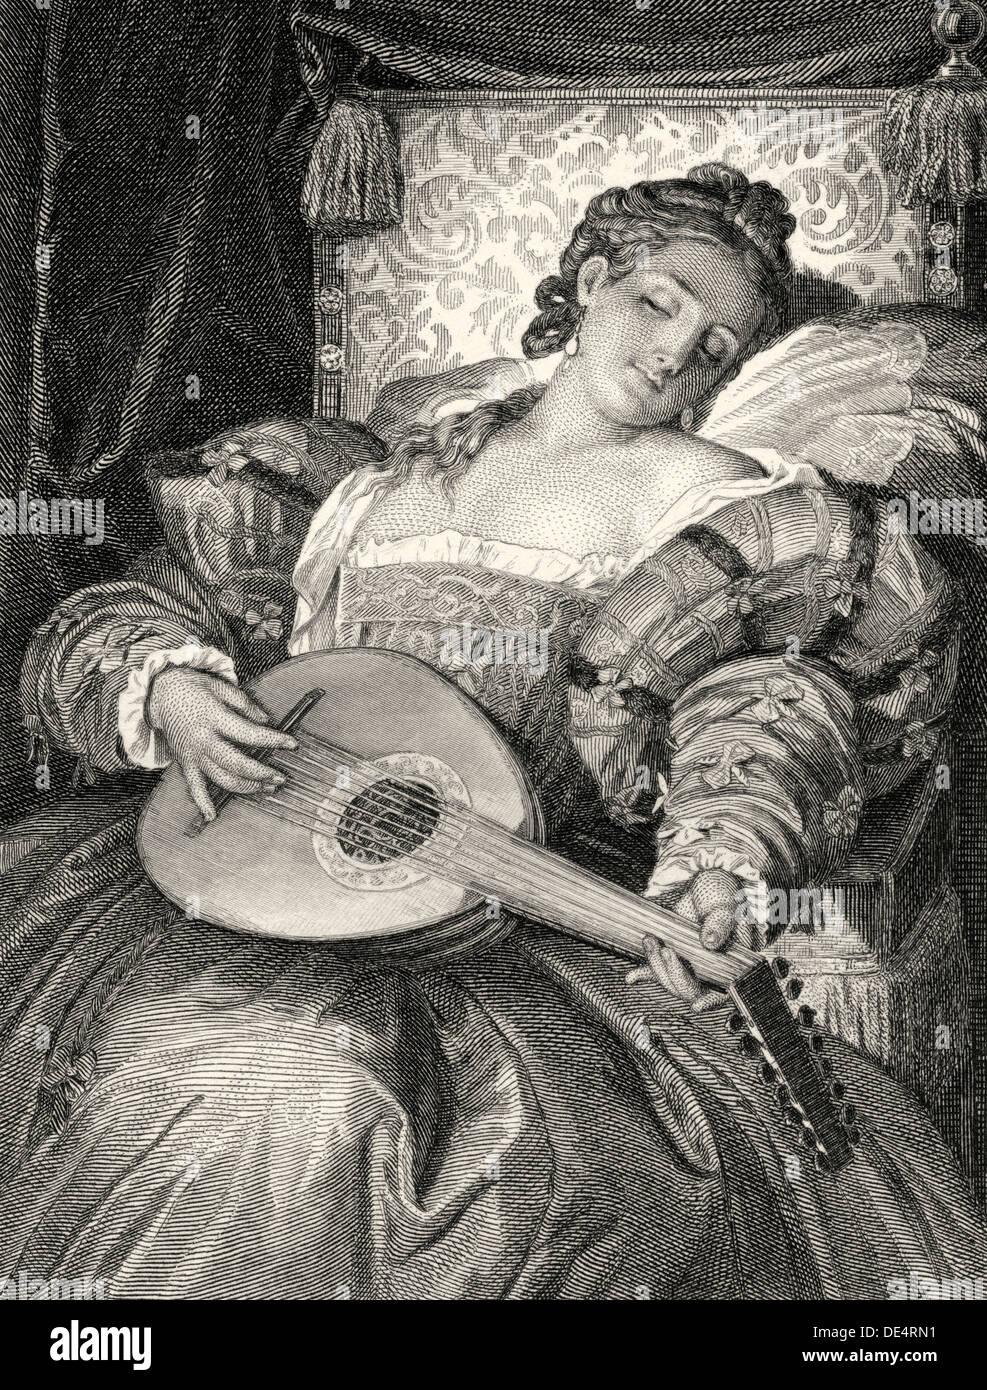 Doña Ana de Mendoza y De La Cerda, Prinzessin Eboli Charakter aus dem Drama Don Carlos oder Don Karlos von Stockbild